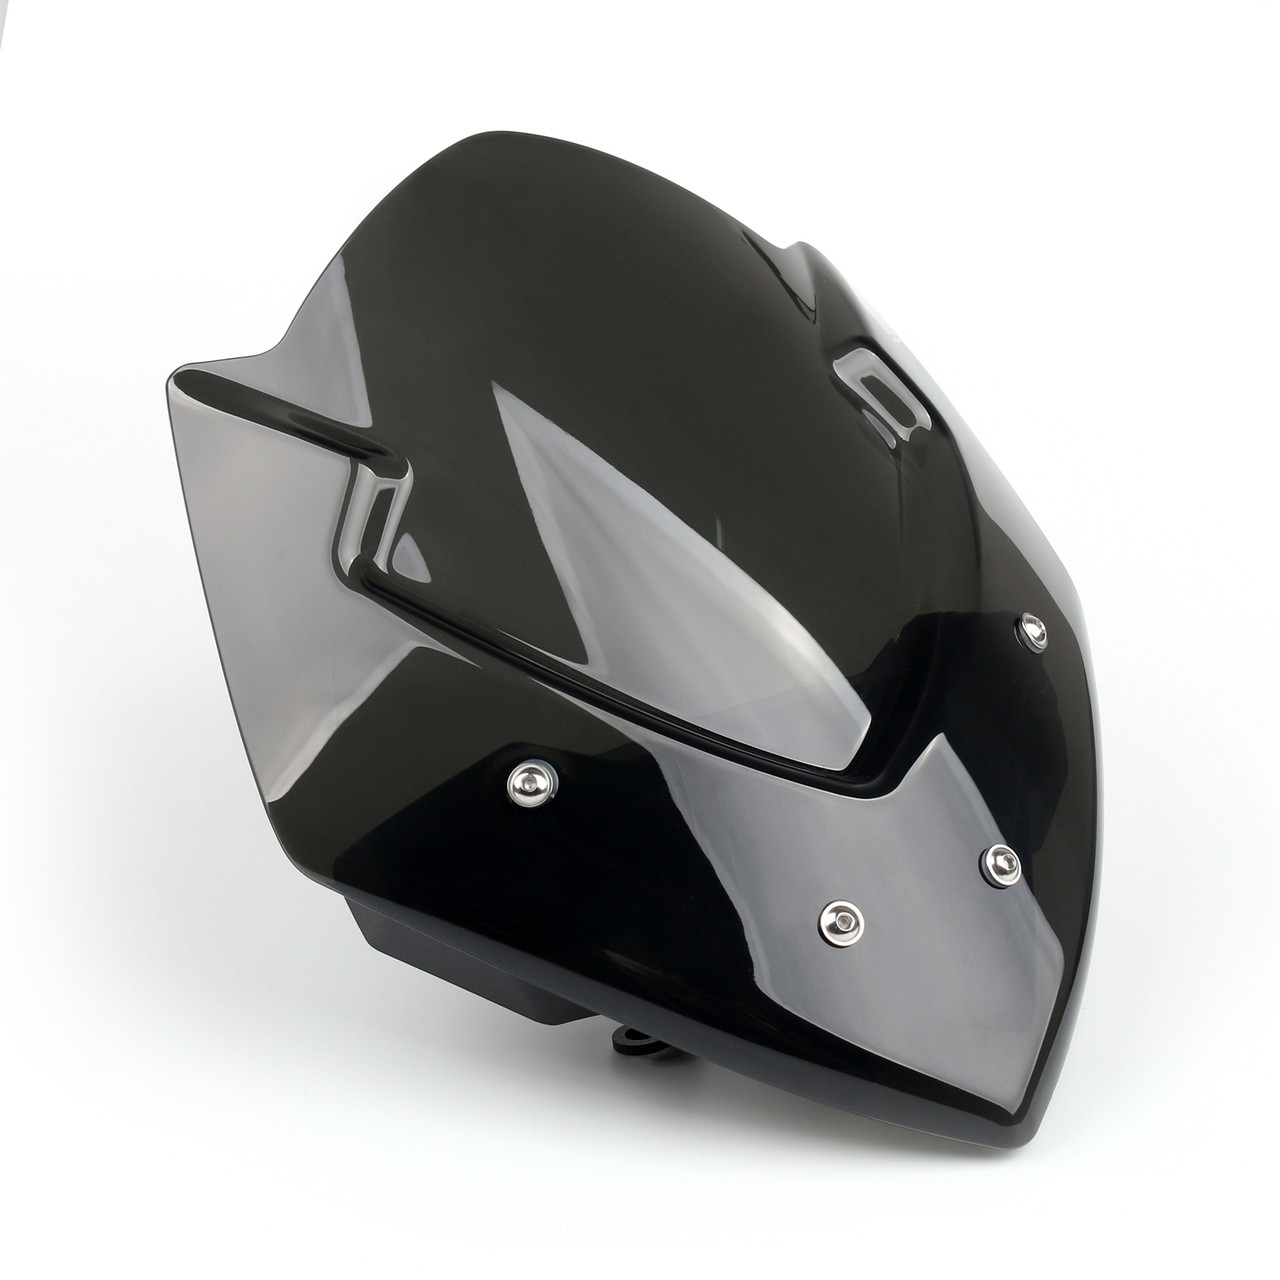 http://www.madhornets.store/AMZ/MotoPart/Windshield/Suzuki/WIN-S317/WIN-S317-Black-1.jpg